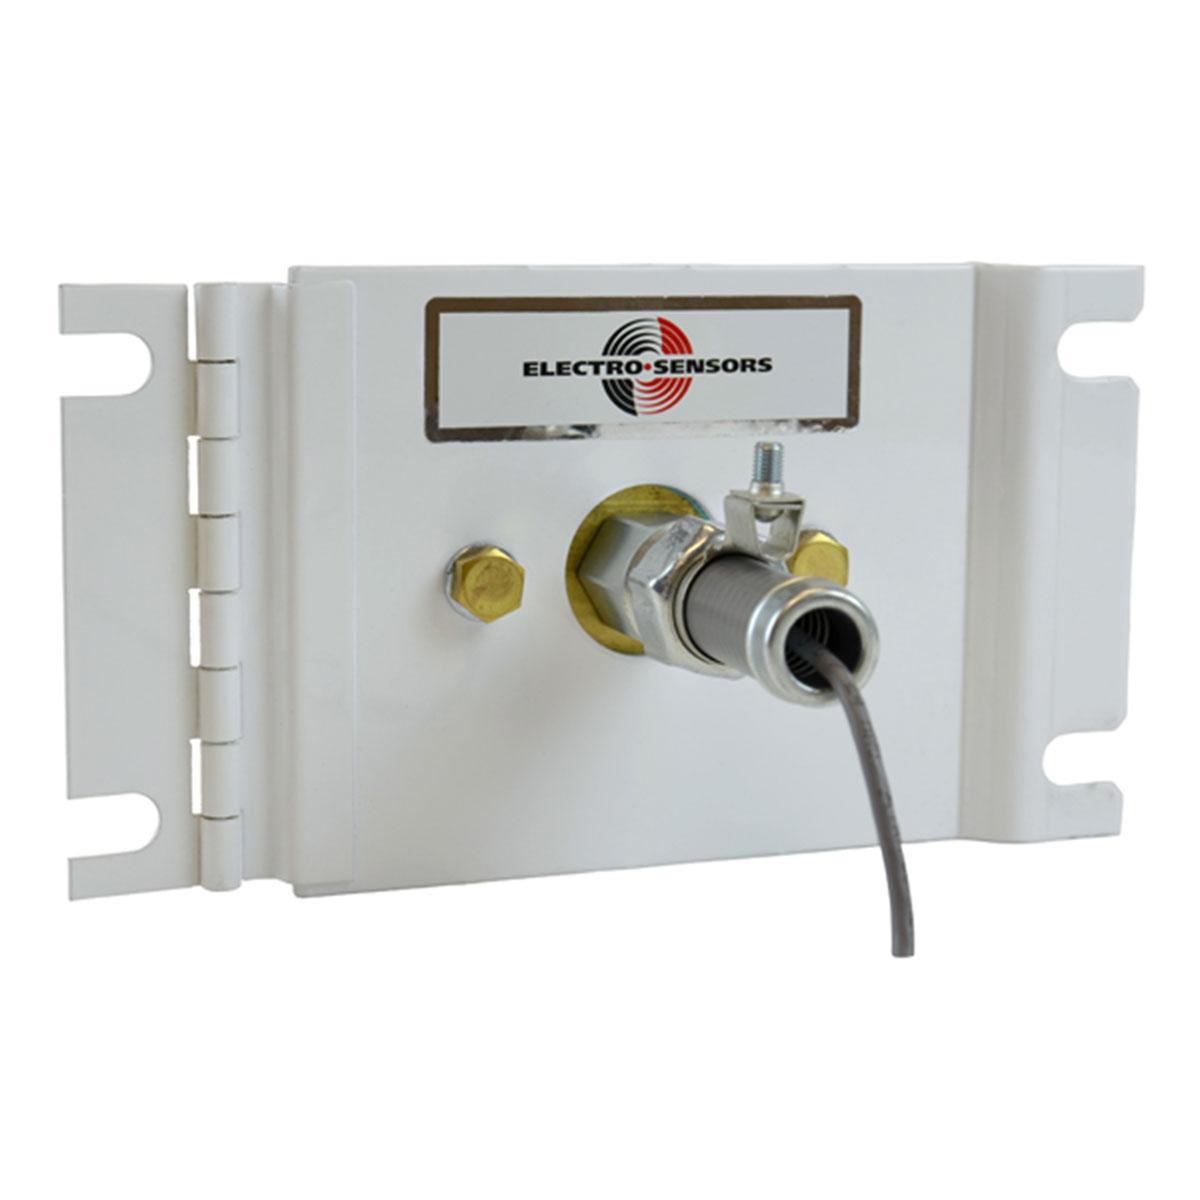 Electro-Sensors_Rub-Door-Block_BHD